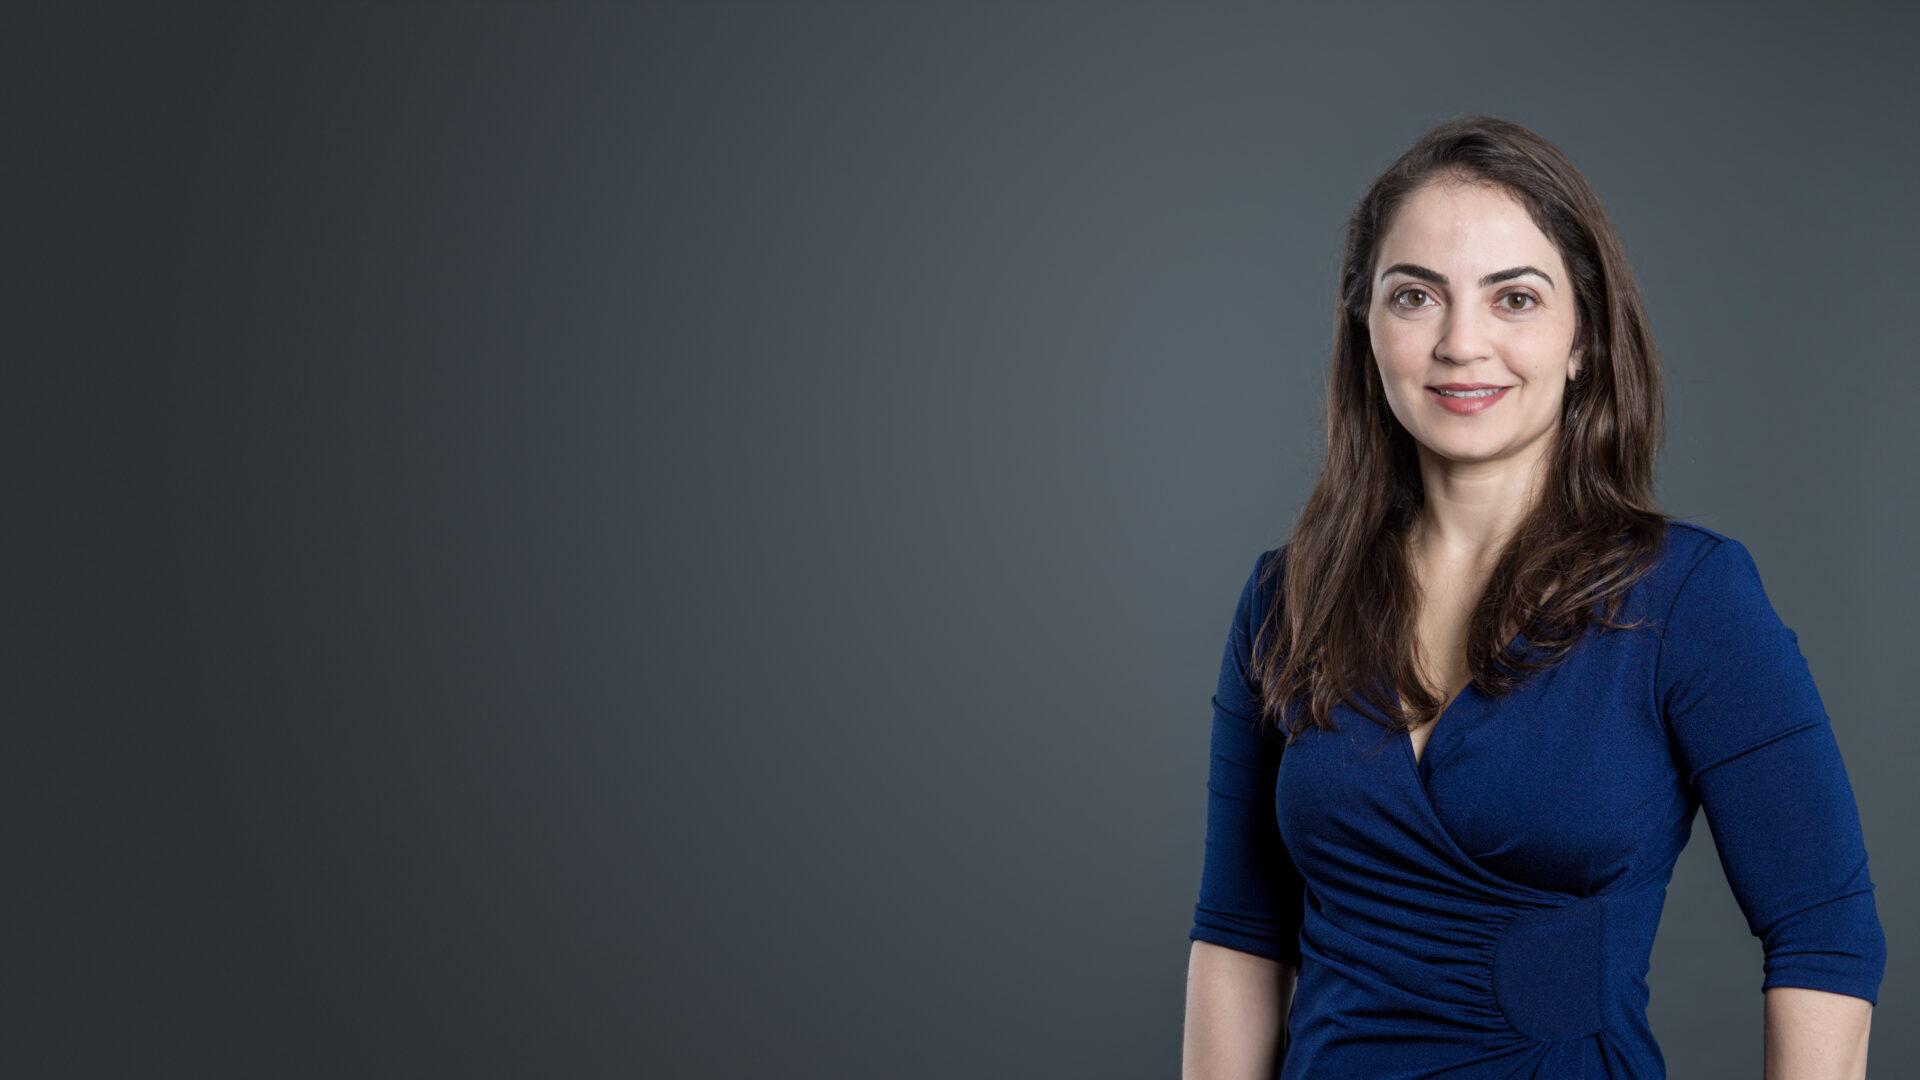 Daniela Cristina da Silva